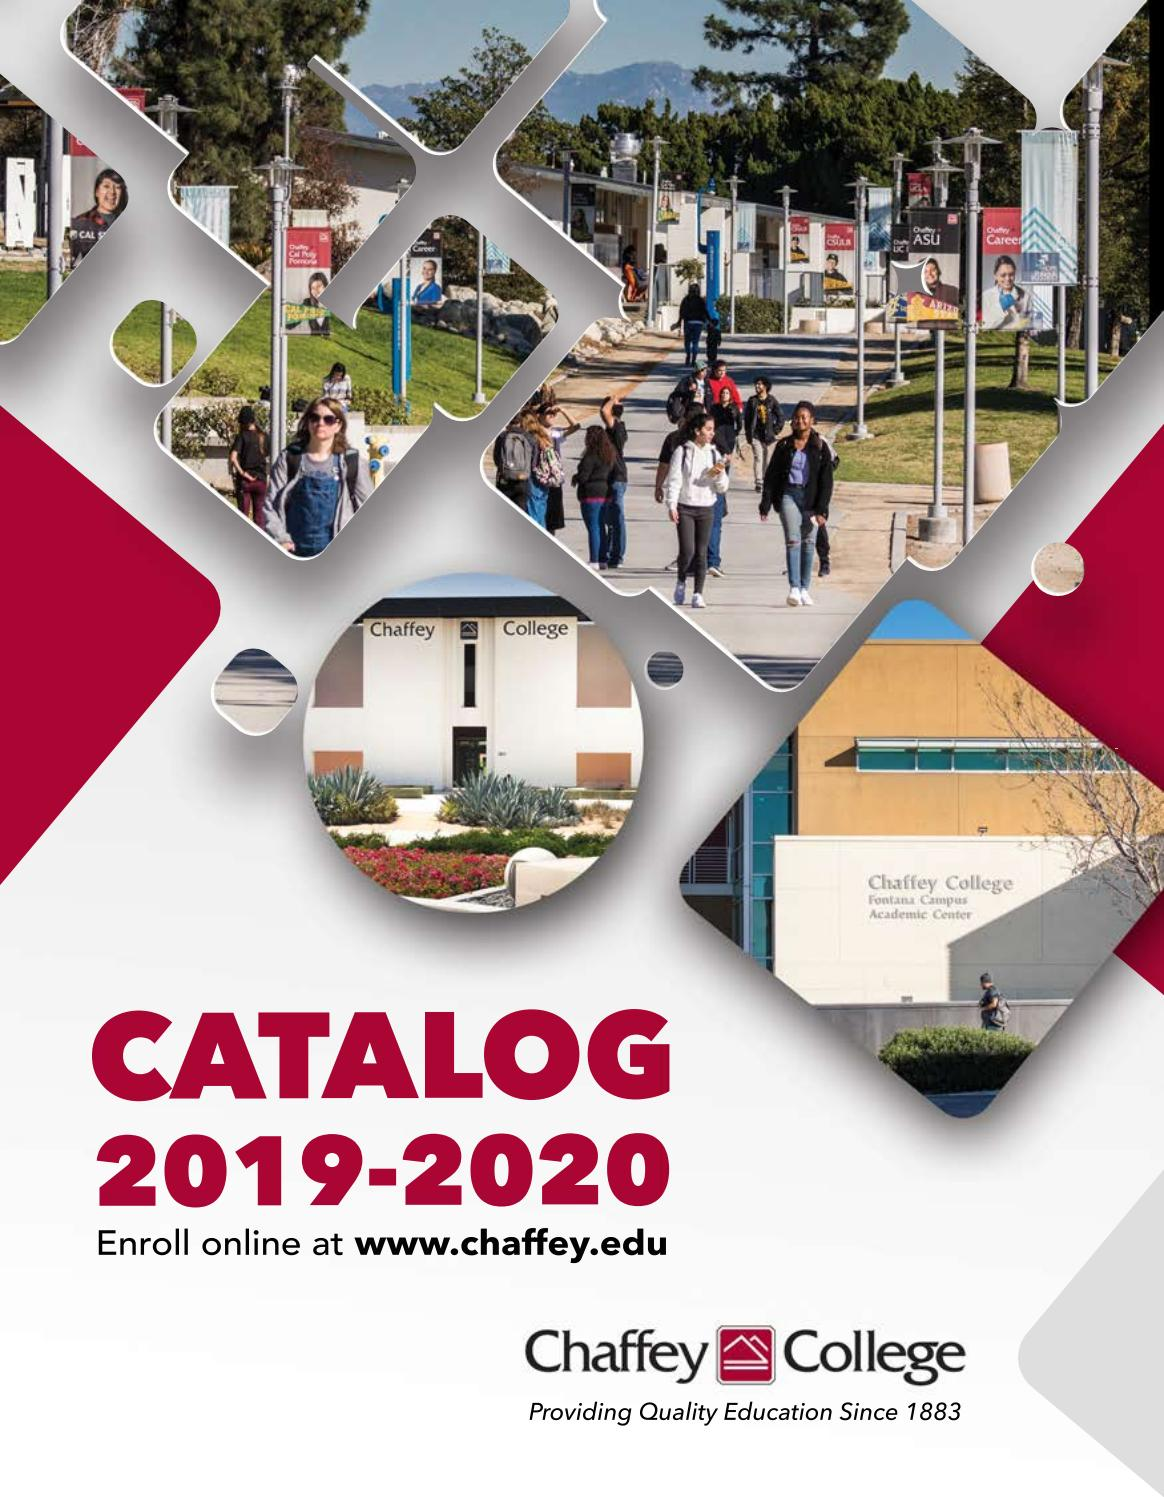 Chaffey College Catalog 2019 - 2020 by Chaffey College - issuu